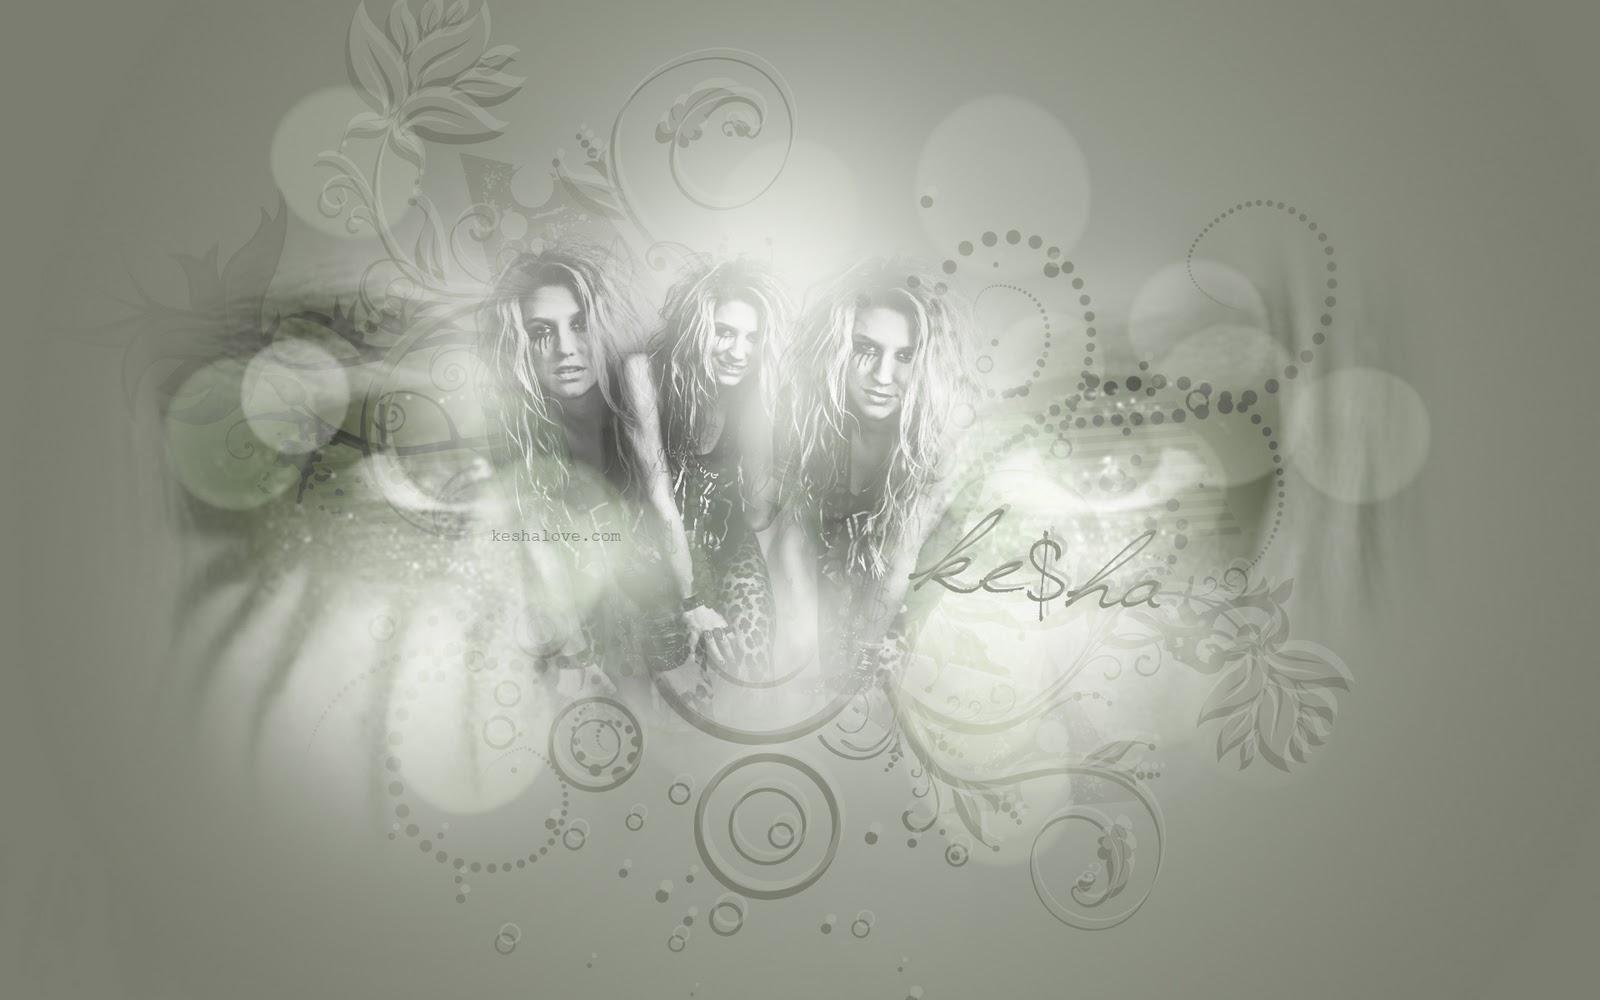 http://4.bp.blogspot.com/-An0pq3Q-iJY/UFmmSi1LBhI/AAAAAAAADGw/dQ0Z1YOG7Rw/s1600/Kesha-Wallpapers-2010-6+%25281%2529.jpg